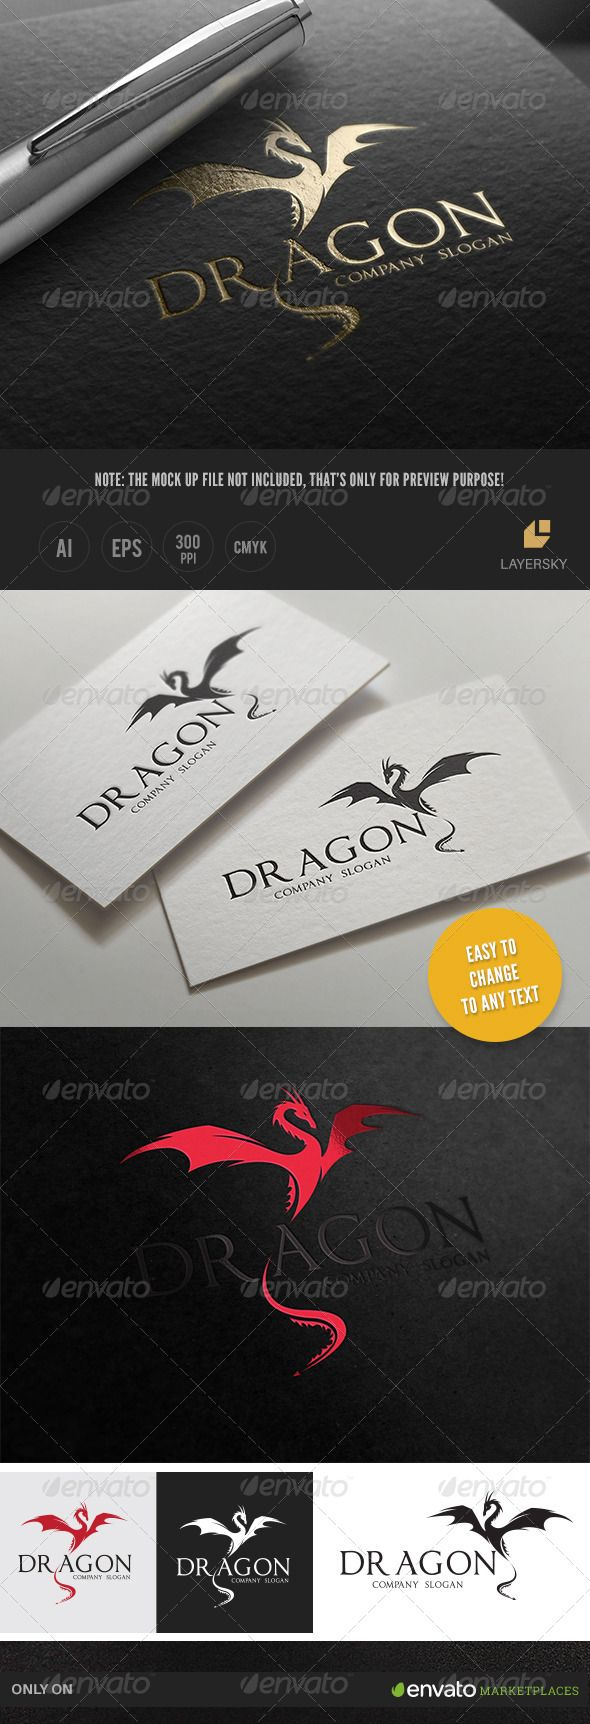 Dragon Logo Template #design #logotype Download: http://graphicriver.net/item/dragon-/8029007?ref=ksioks